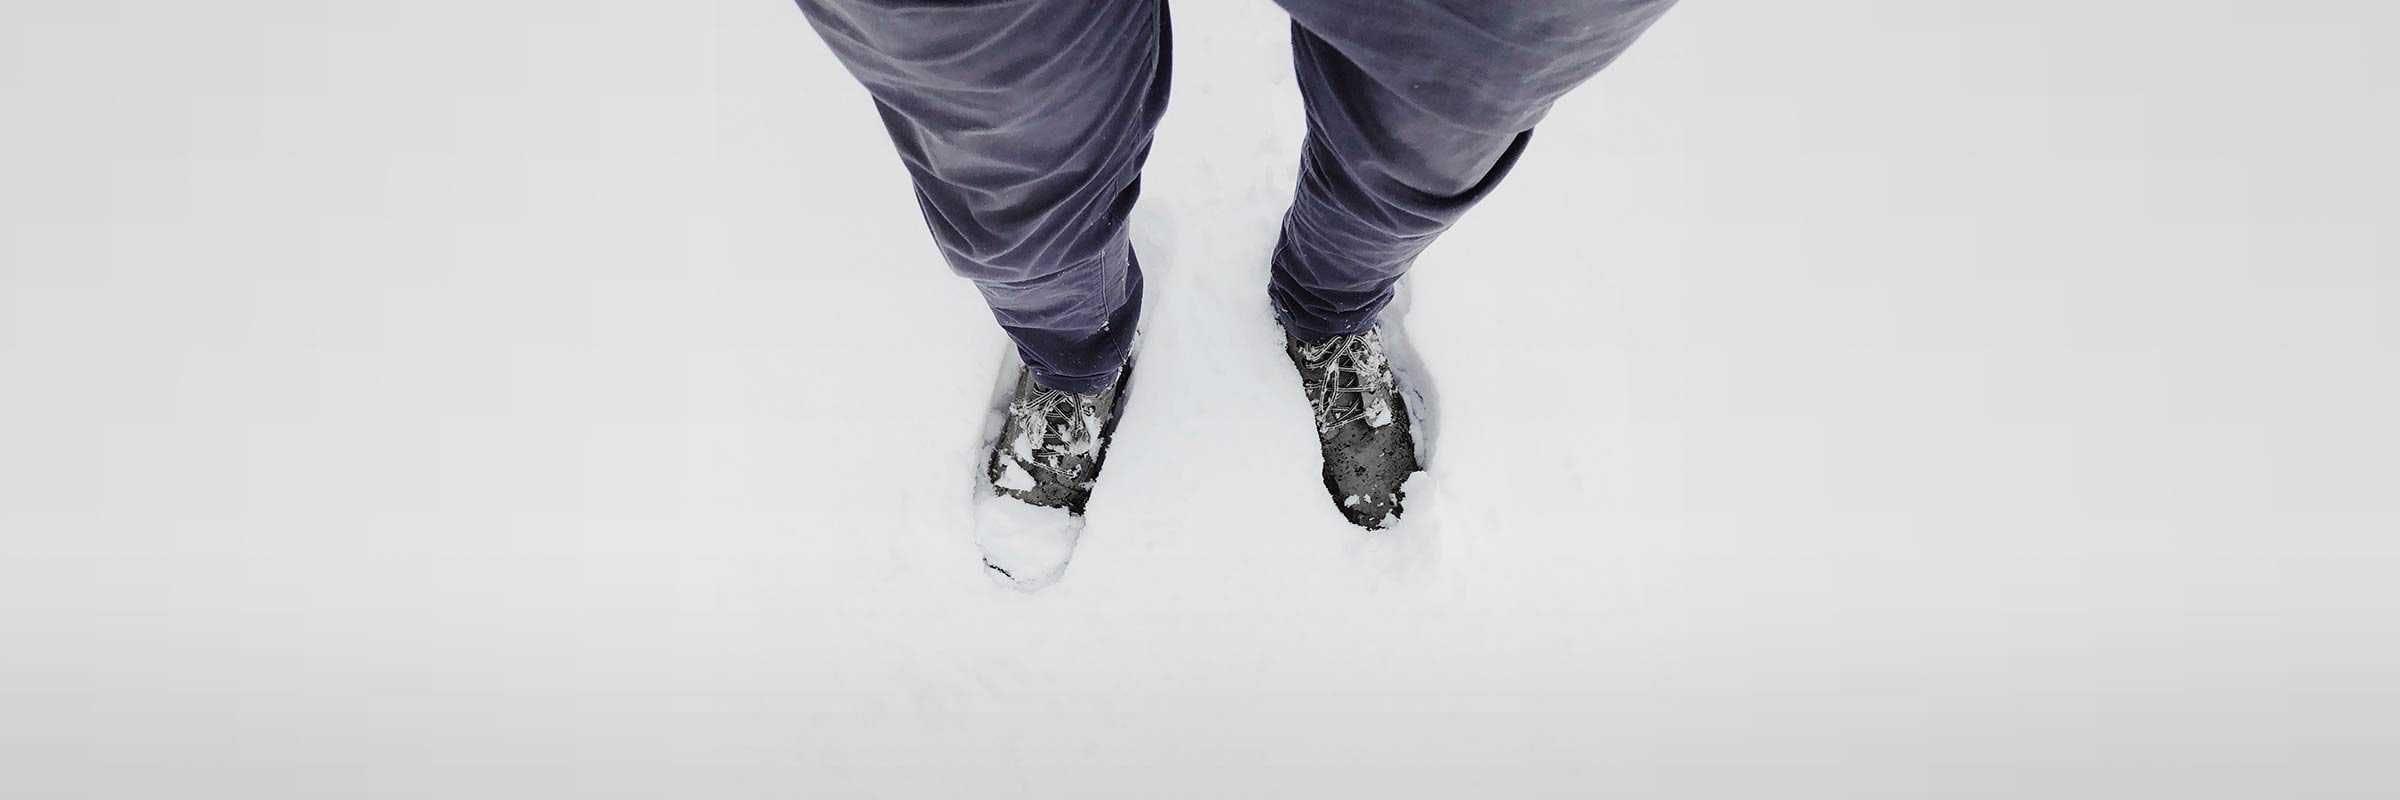 Baffin, Lowa, Merrell, Sorel, UGG Australia. Most Popular Winter Boots for Men